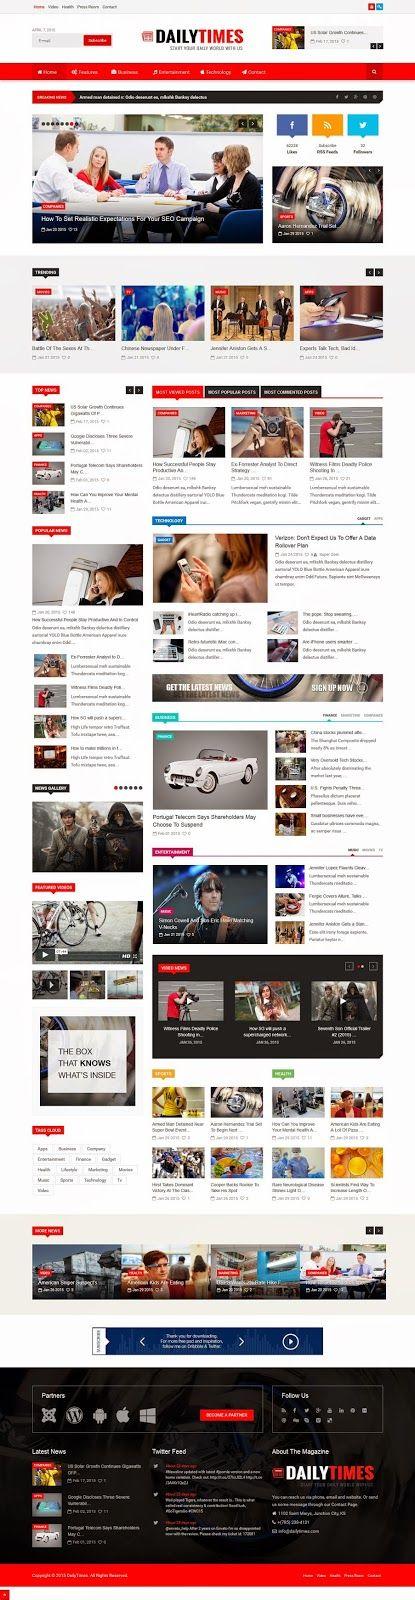 25 best News Website Design Ideas images on Pinterest | Website ...